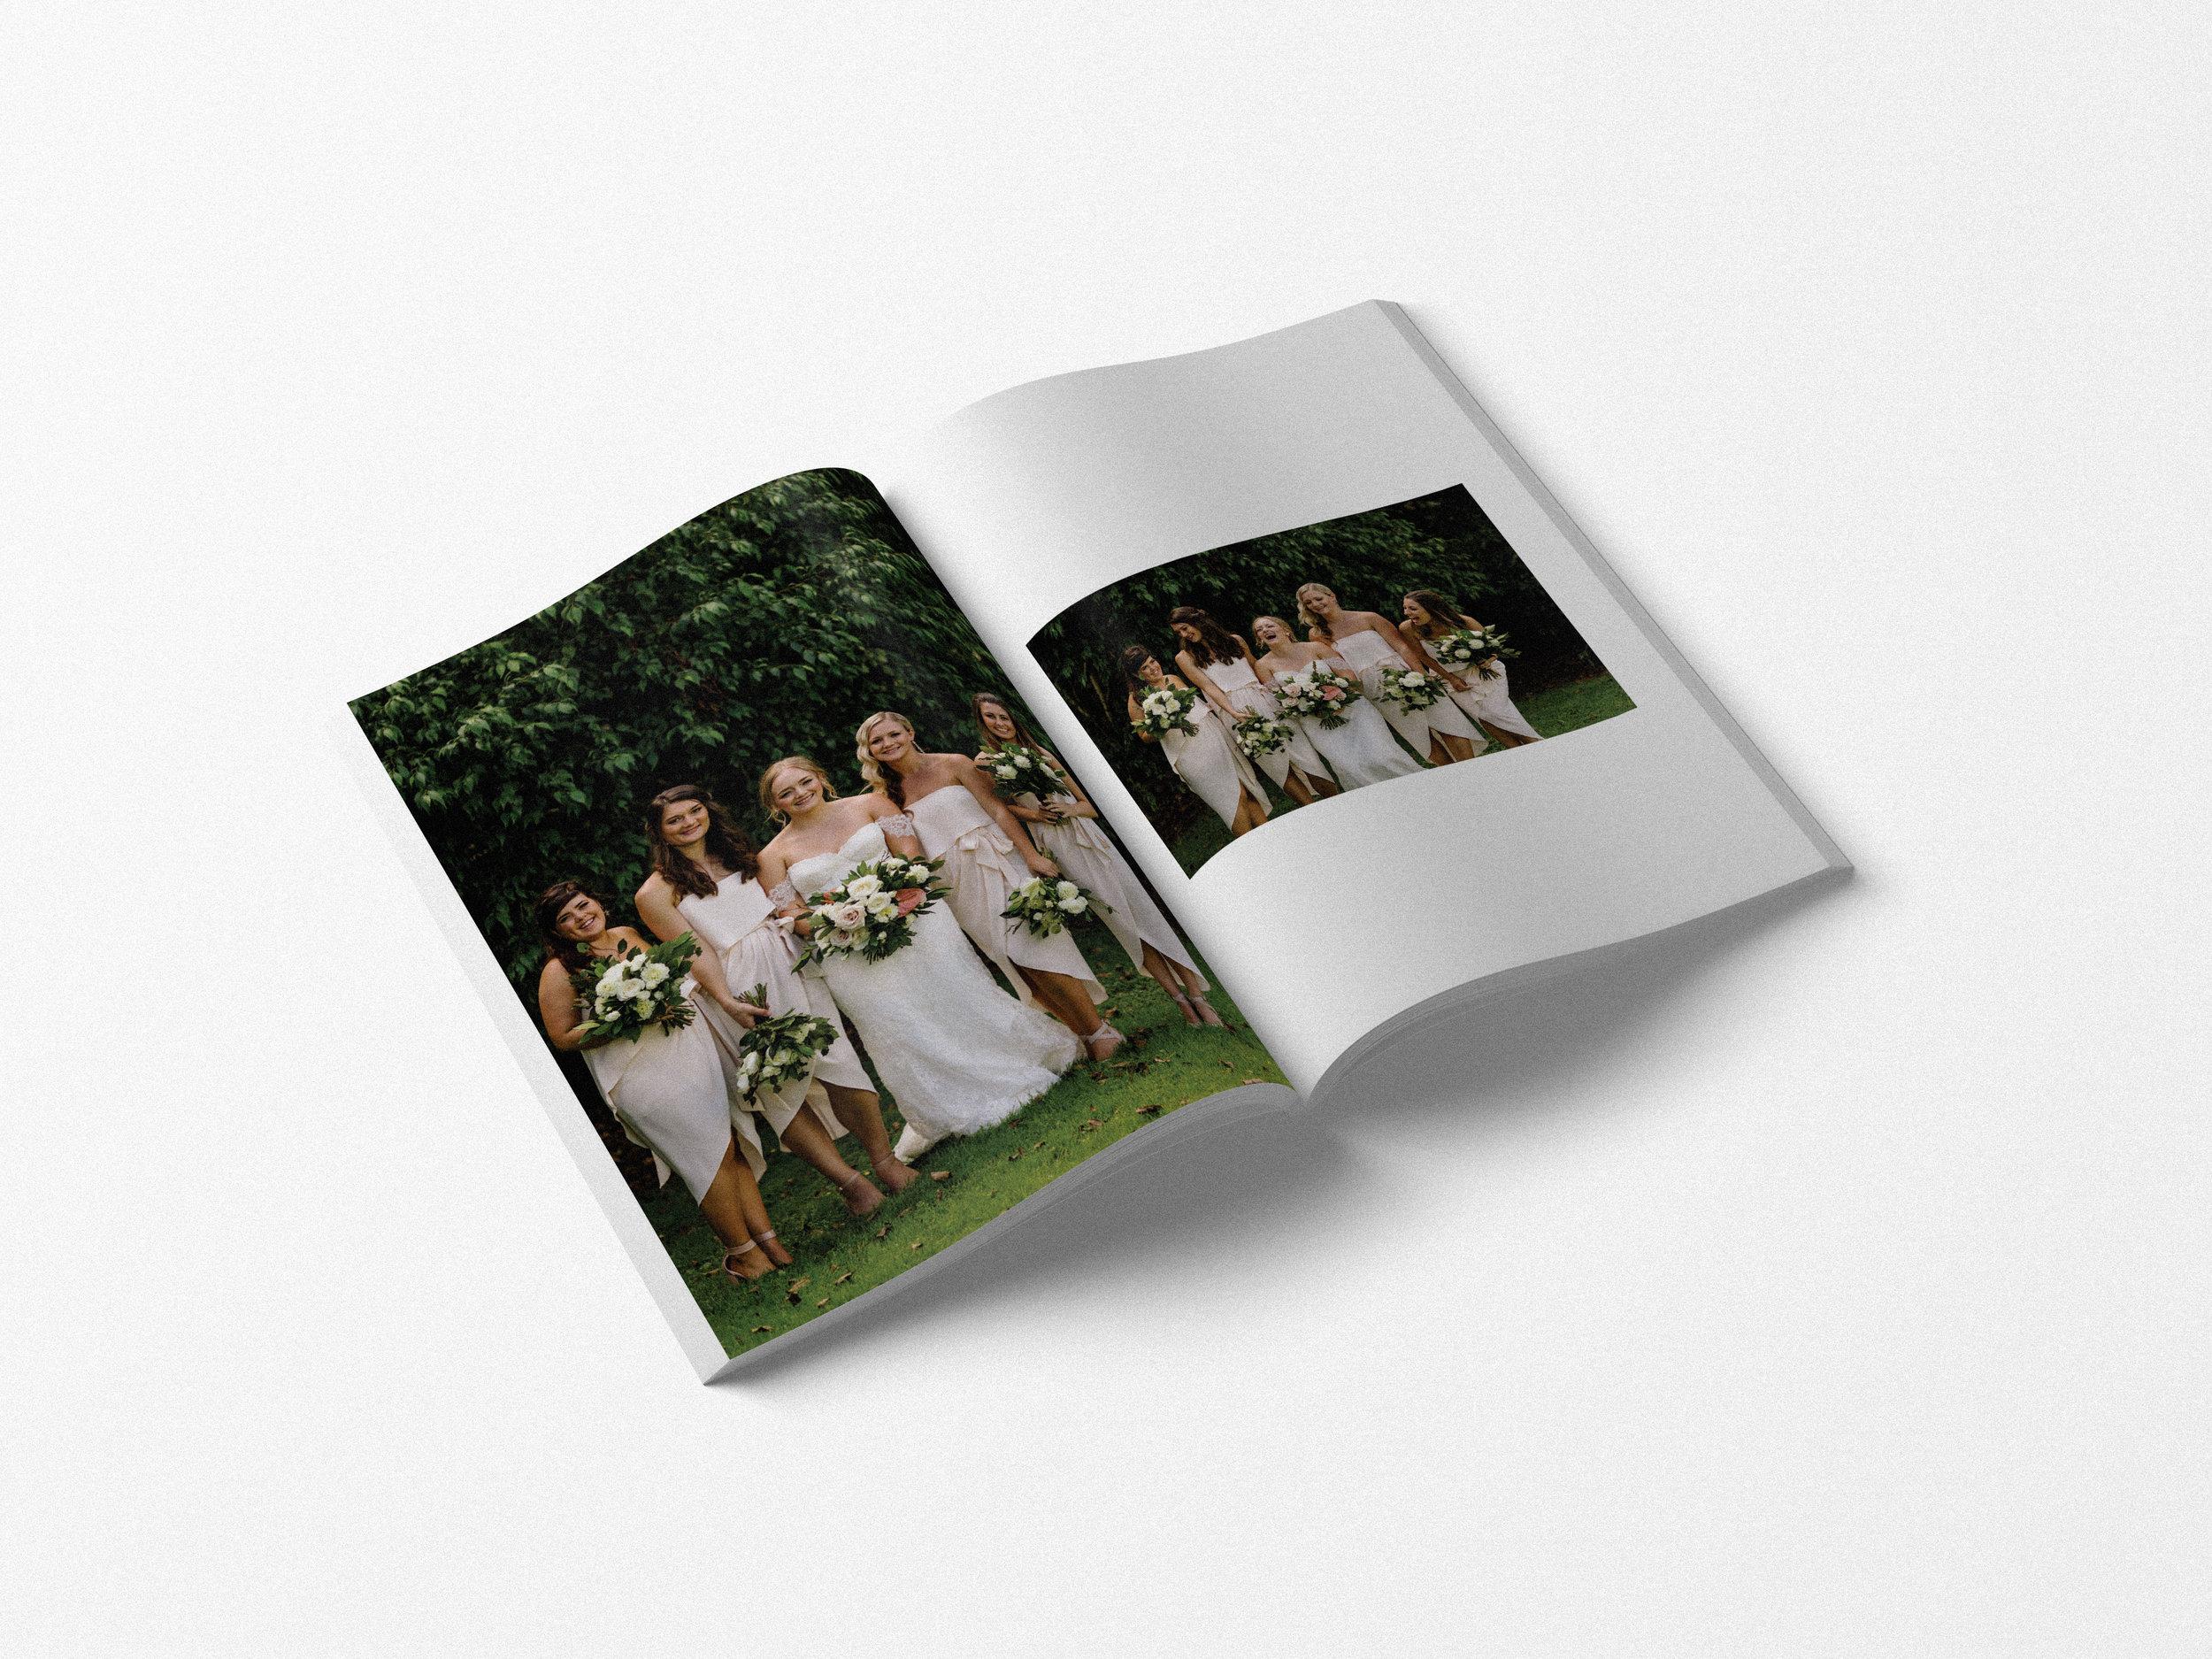 Jasmin-Paul-Wedding-Zine-Internal-Page-3.png